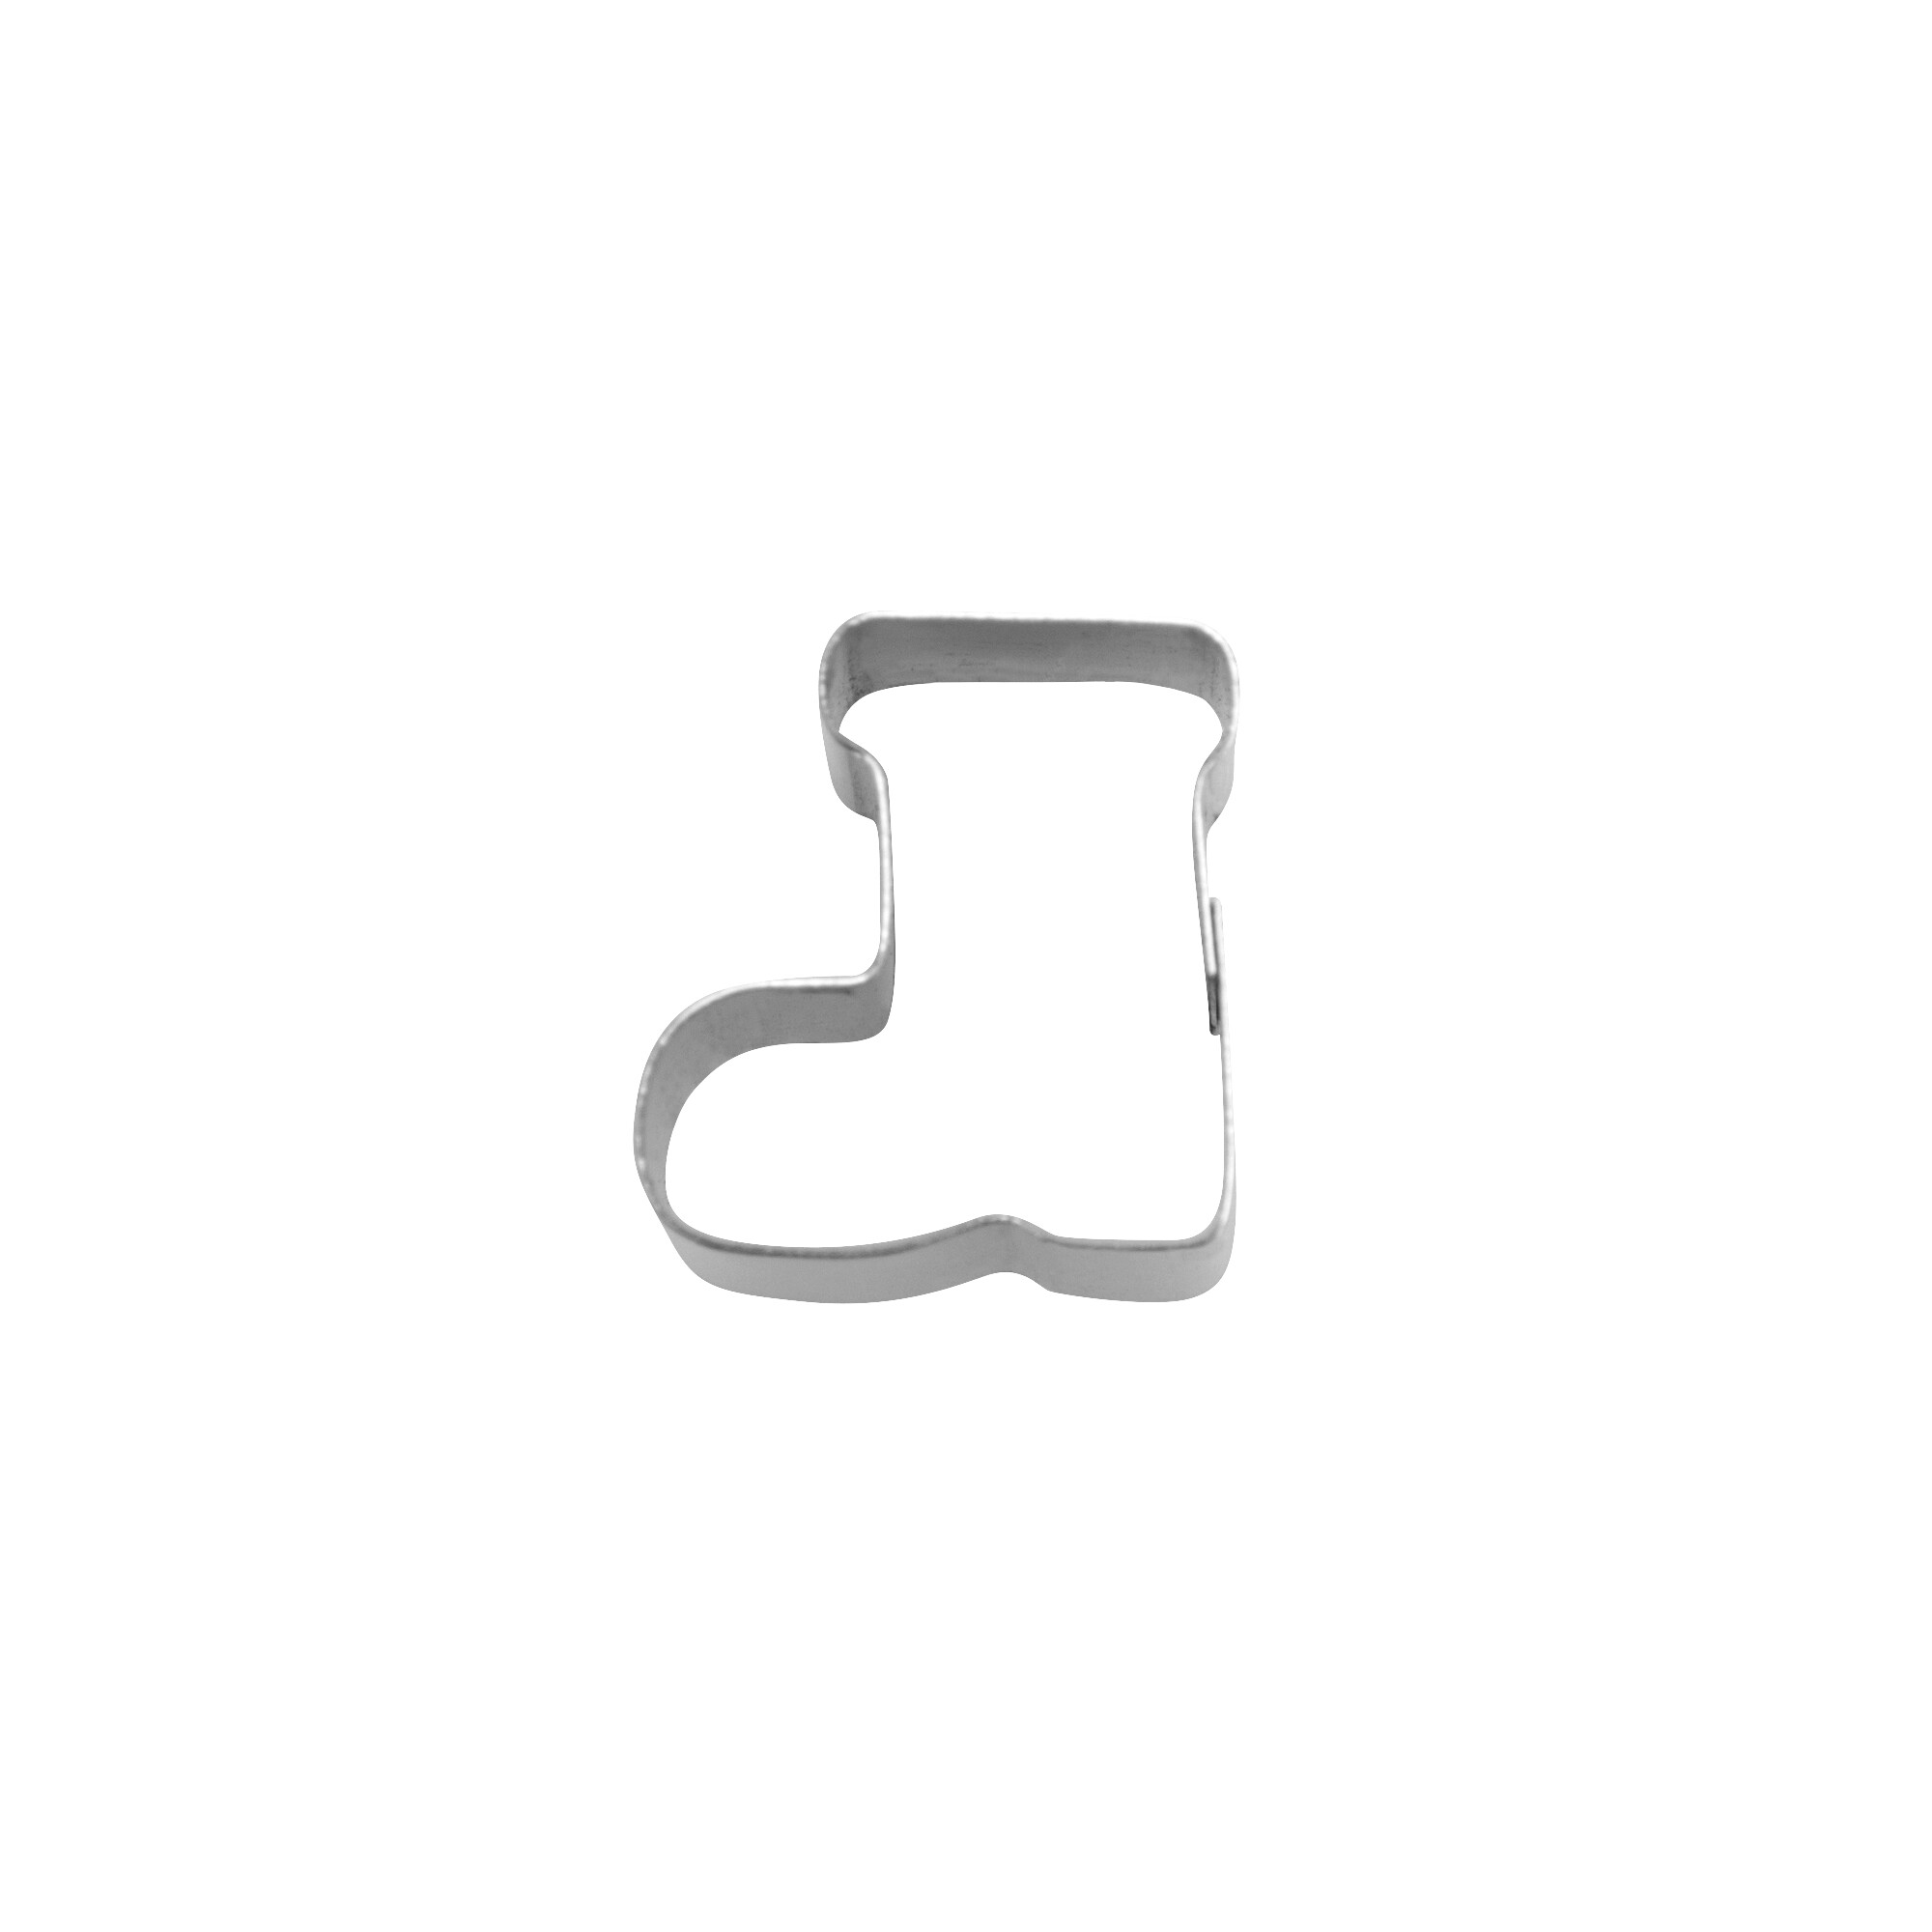 Ausstecher - Stiefel - Mini